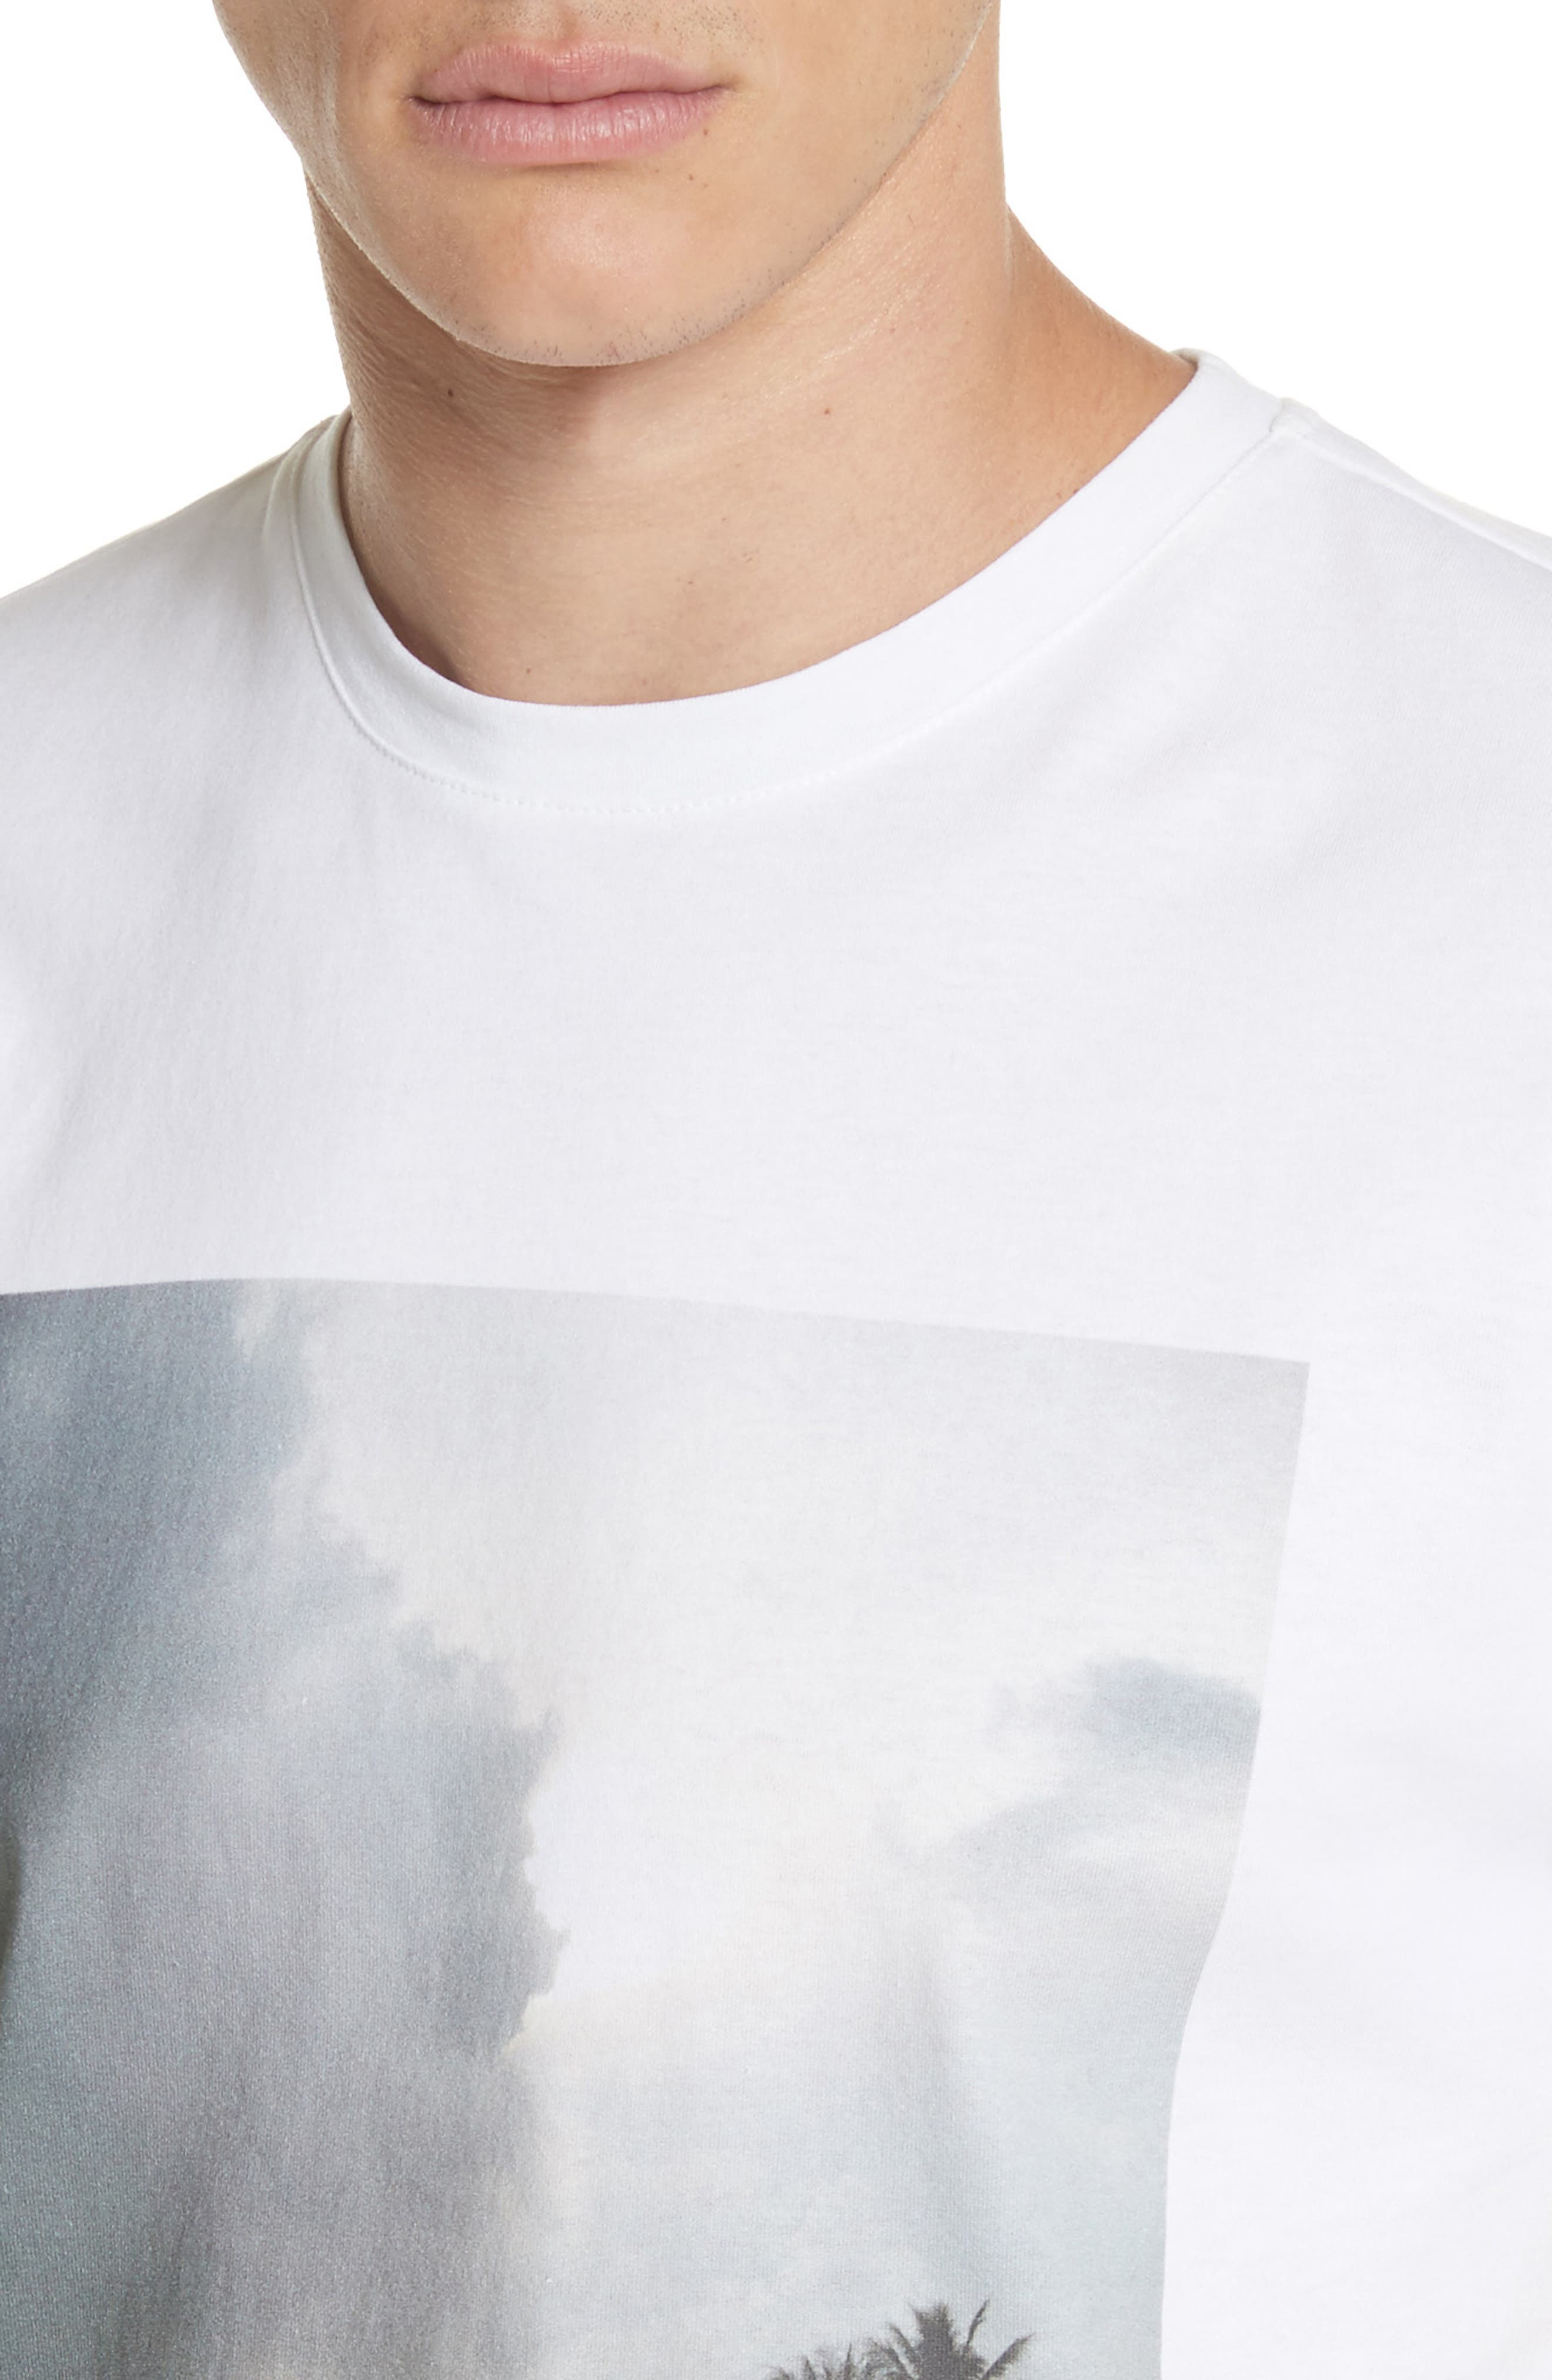 Tropicool Graphic T-Shirt,                             Alternate thumbnail 4, color,                             100